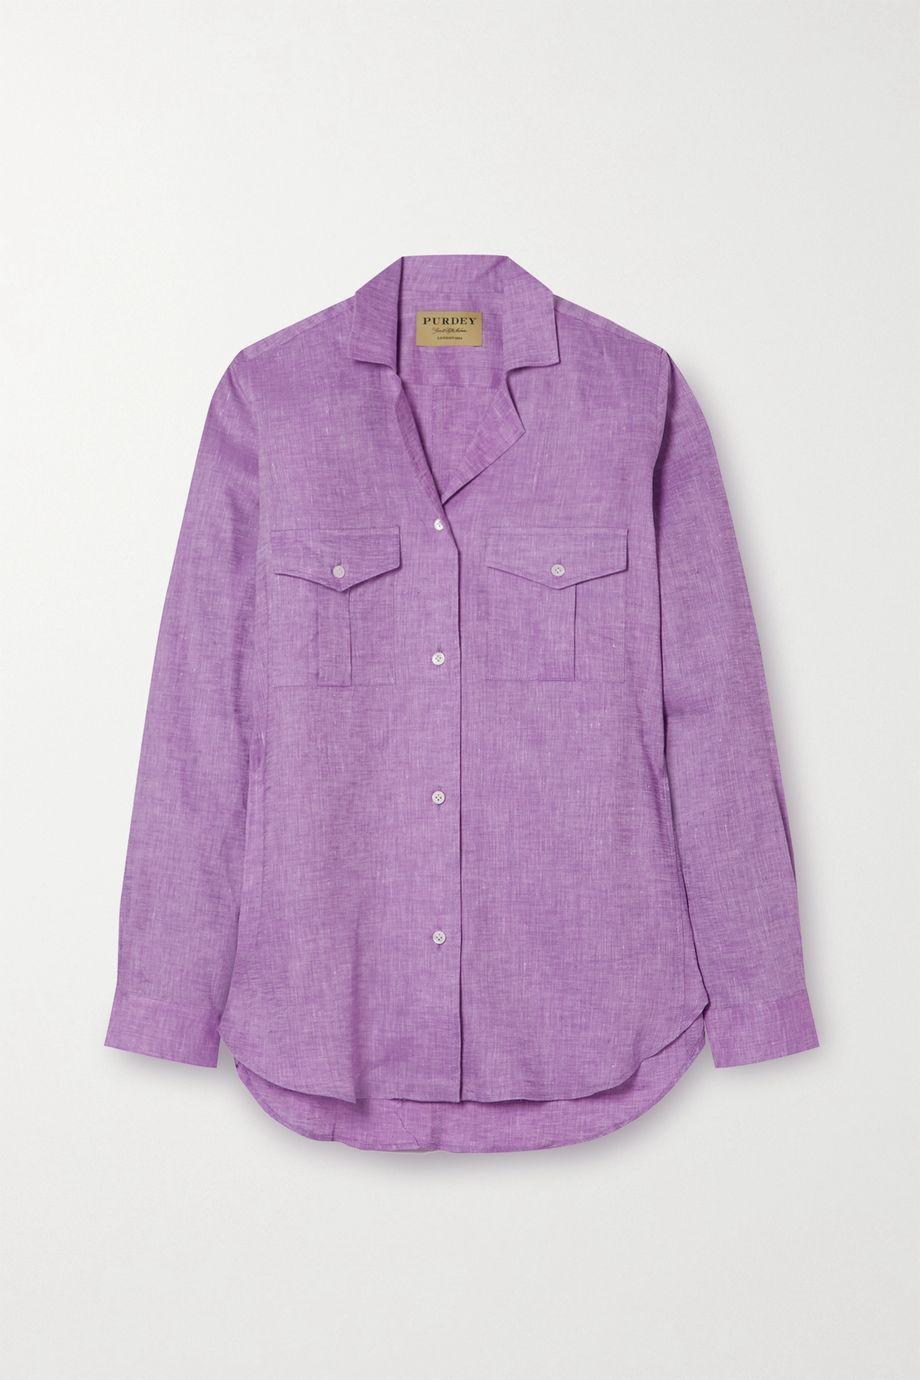 Purdey Easylife linen shirt